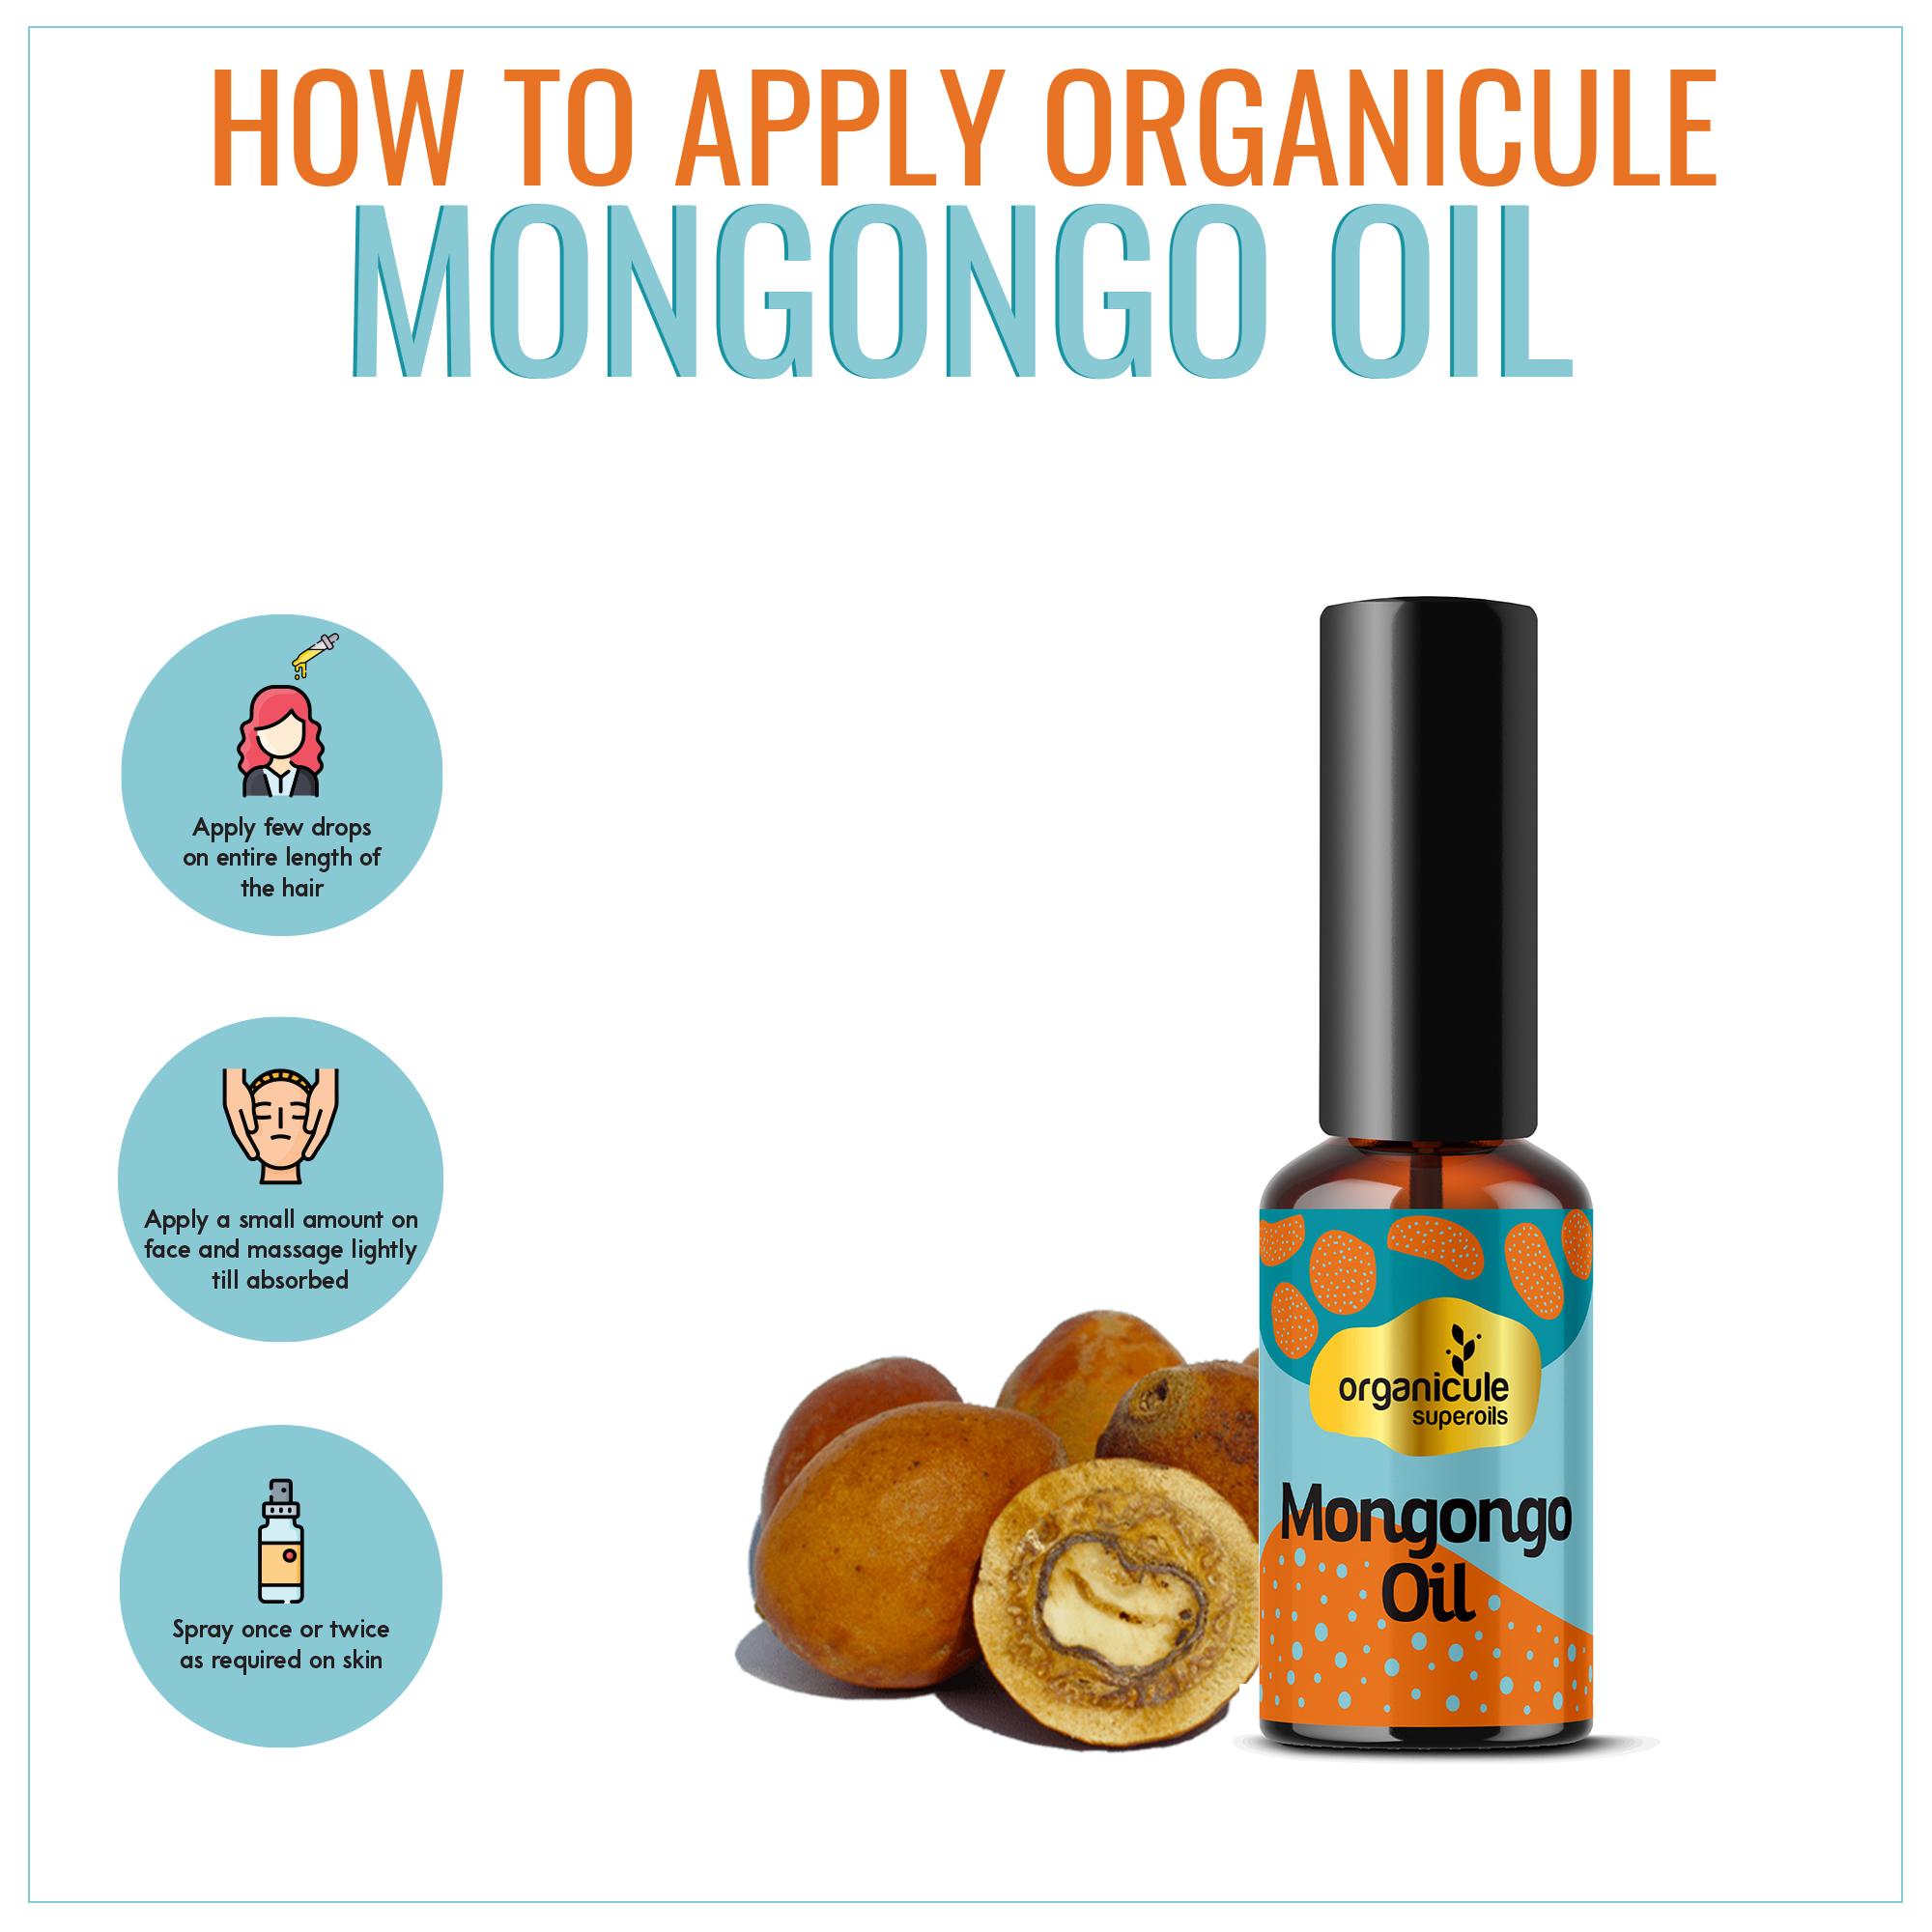 [MPLUS] ORGANICULE Superoils Mongongo Oil 30ml